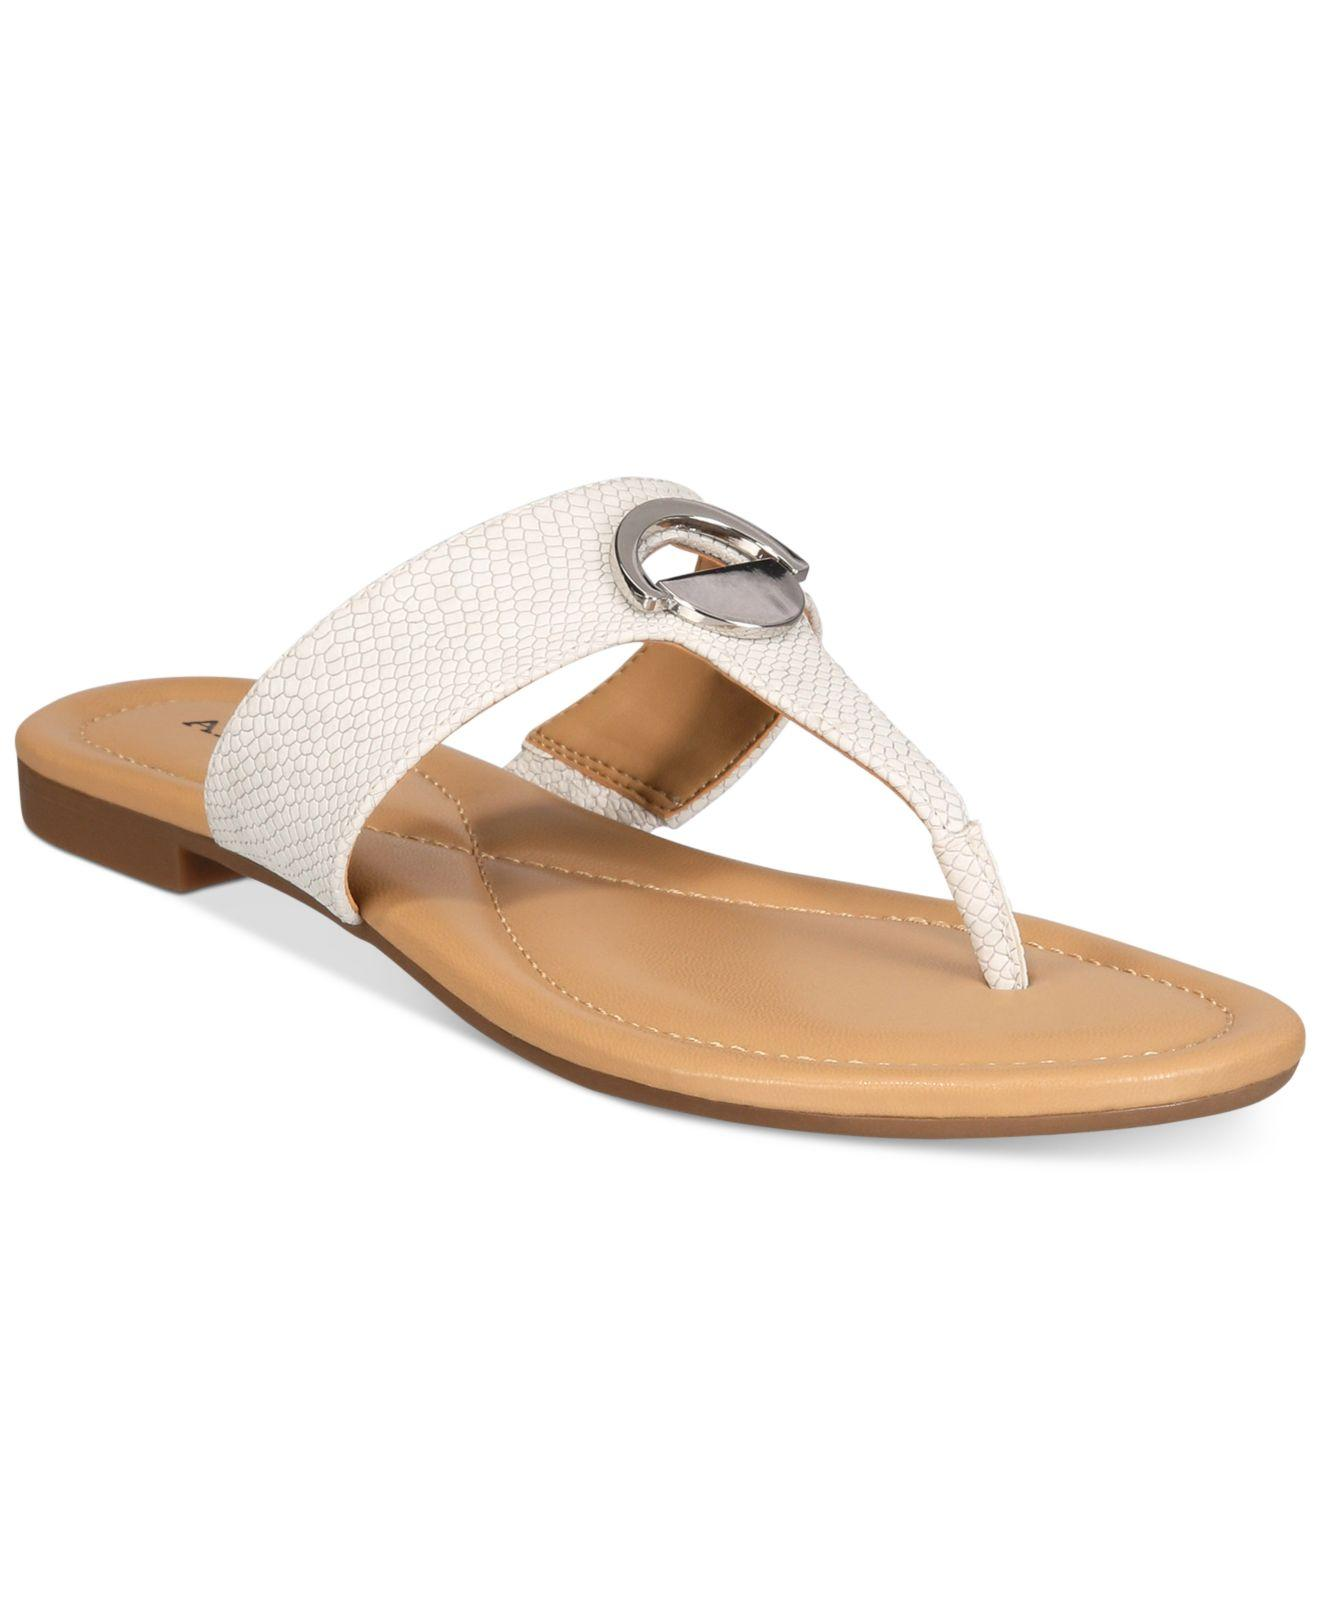 Lyst Alfani Women S Holliss T Strap Thong Sandals In White